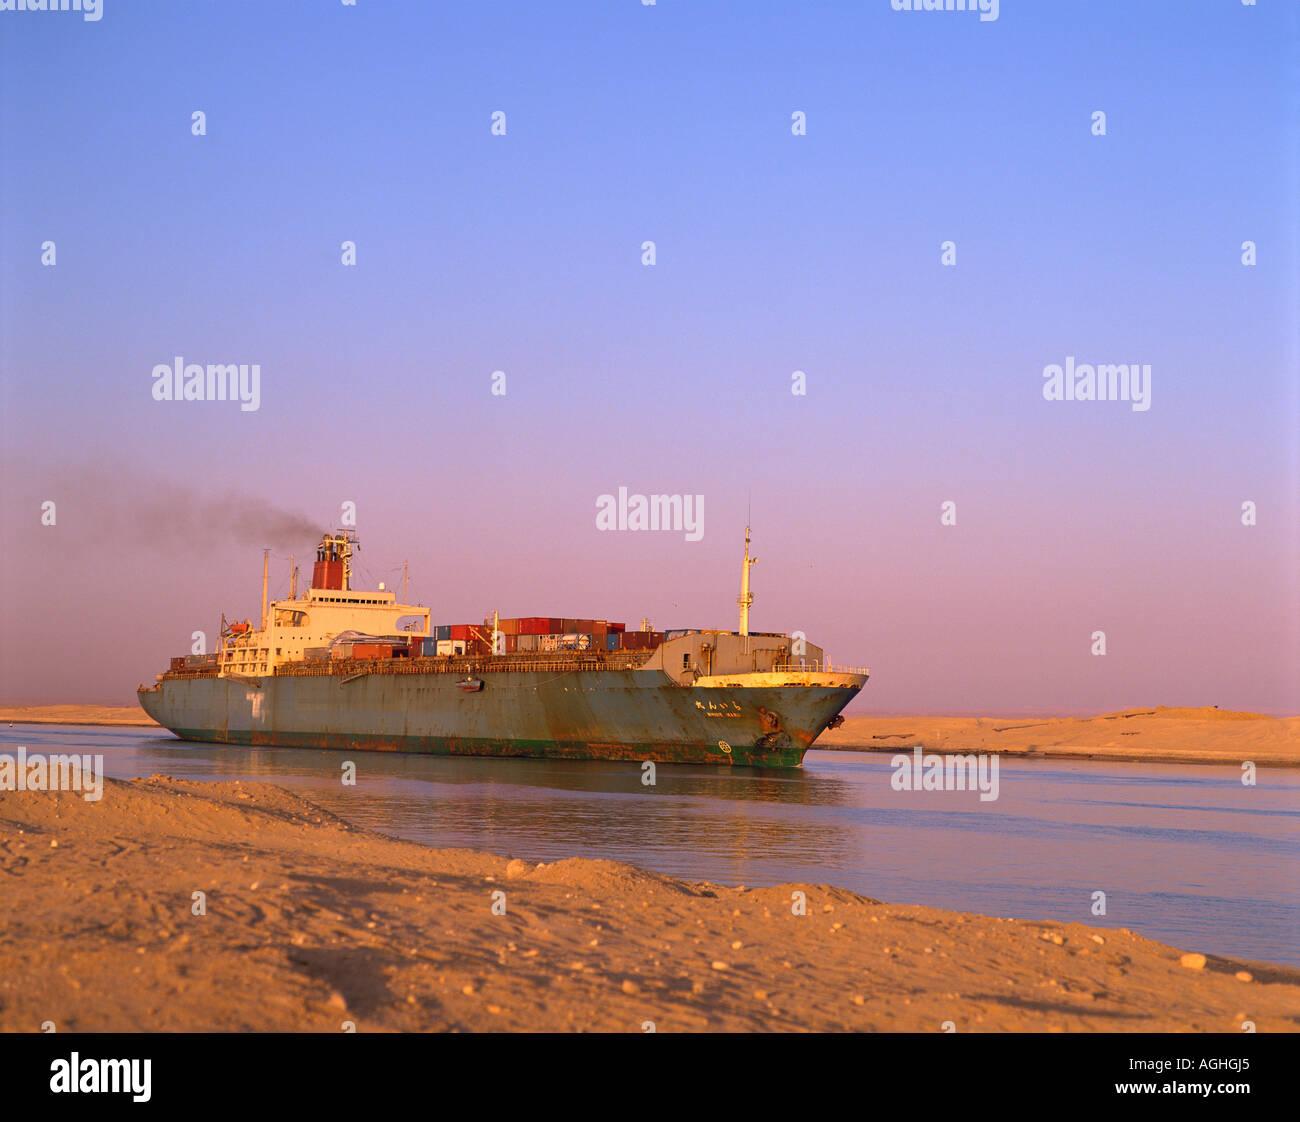 Egypt Suez Canal Cargo Ship Stock Photo